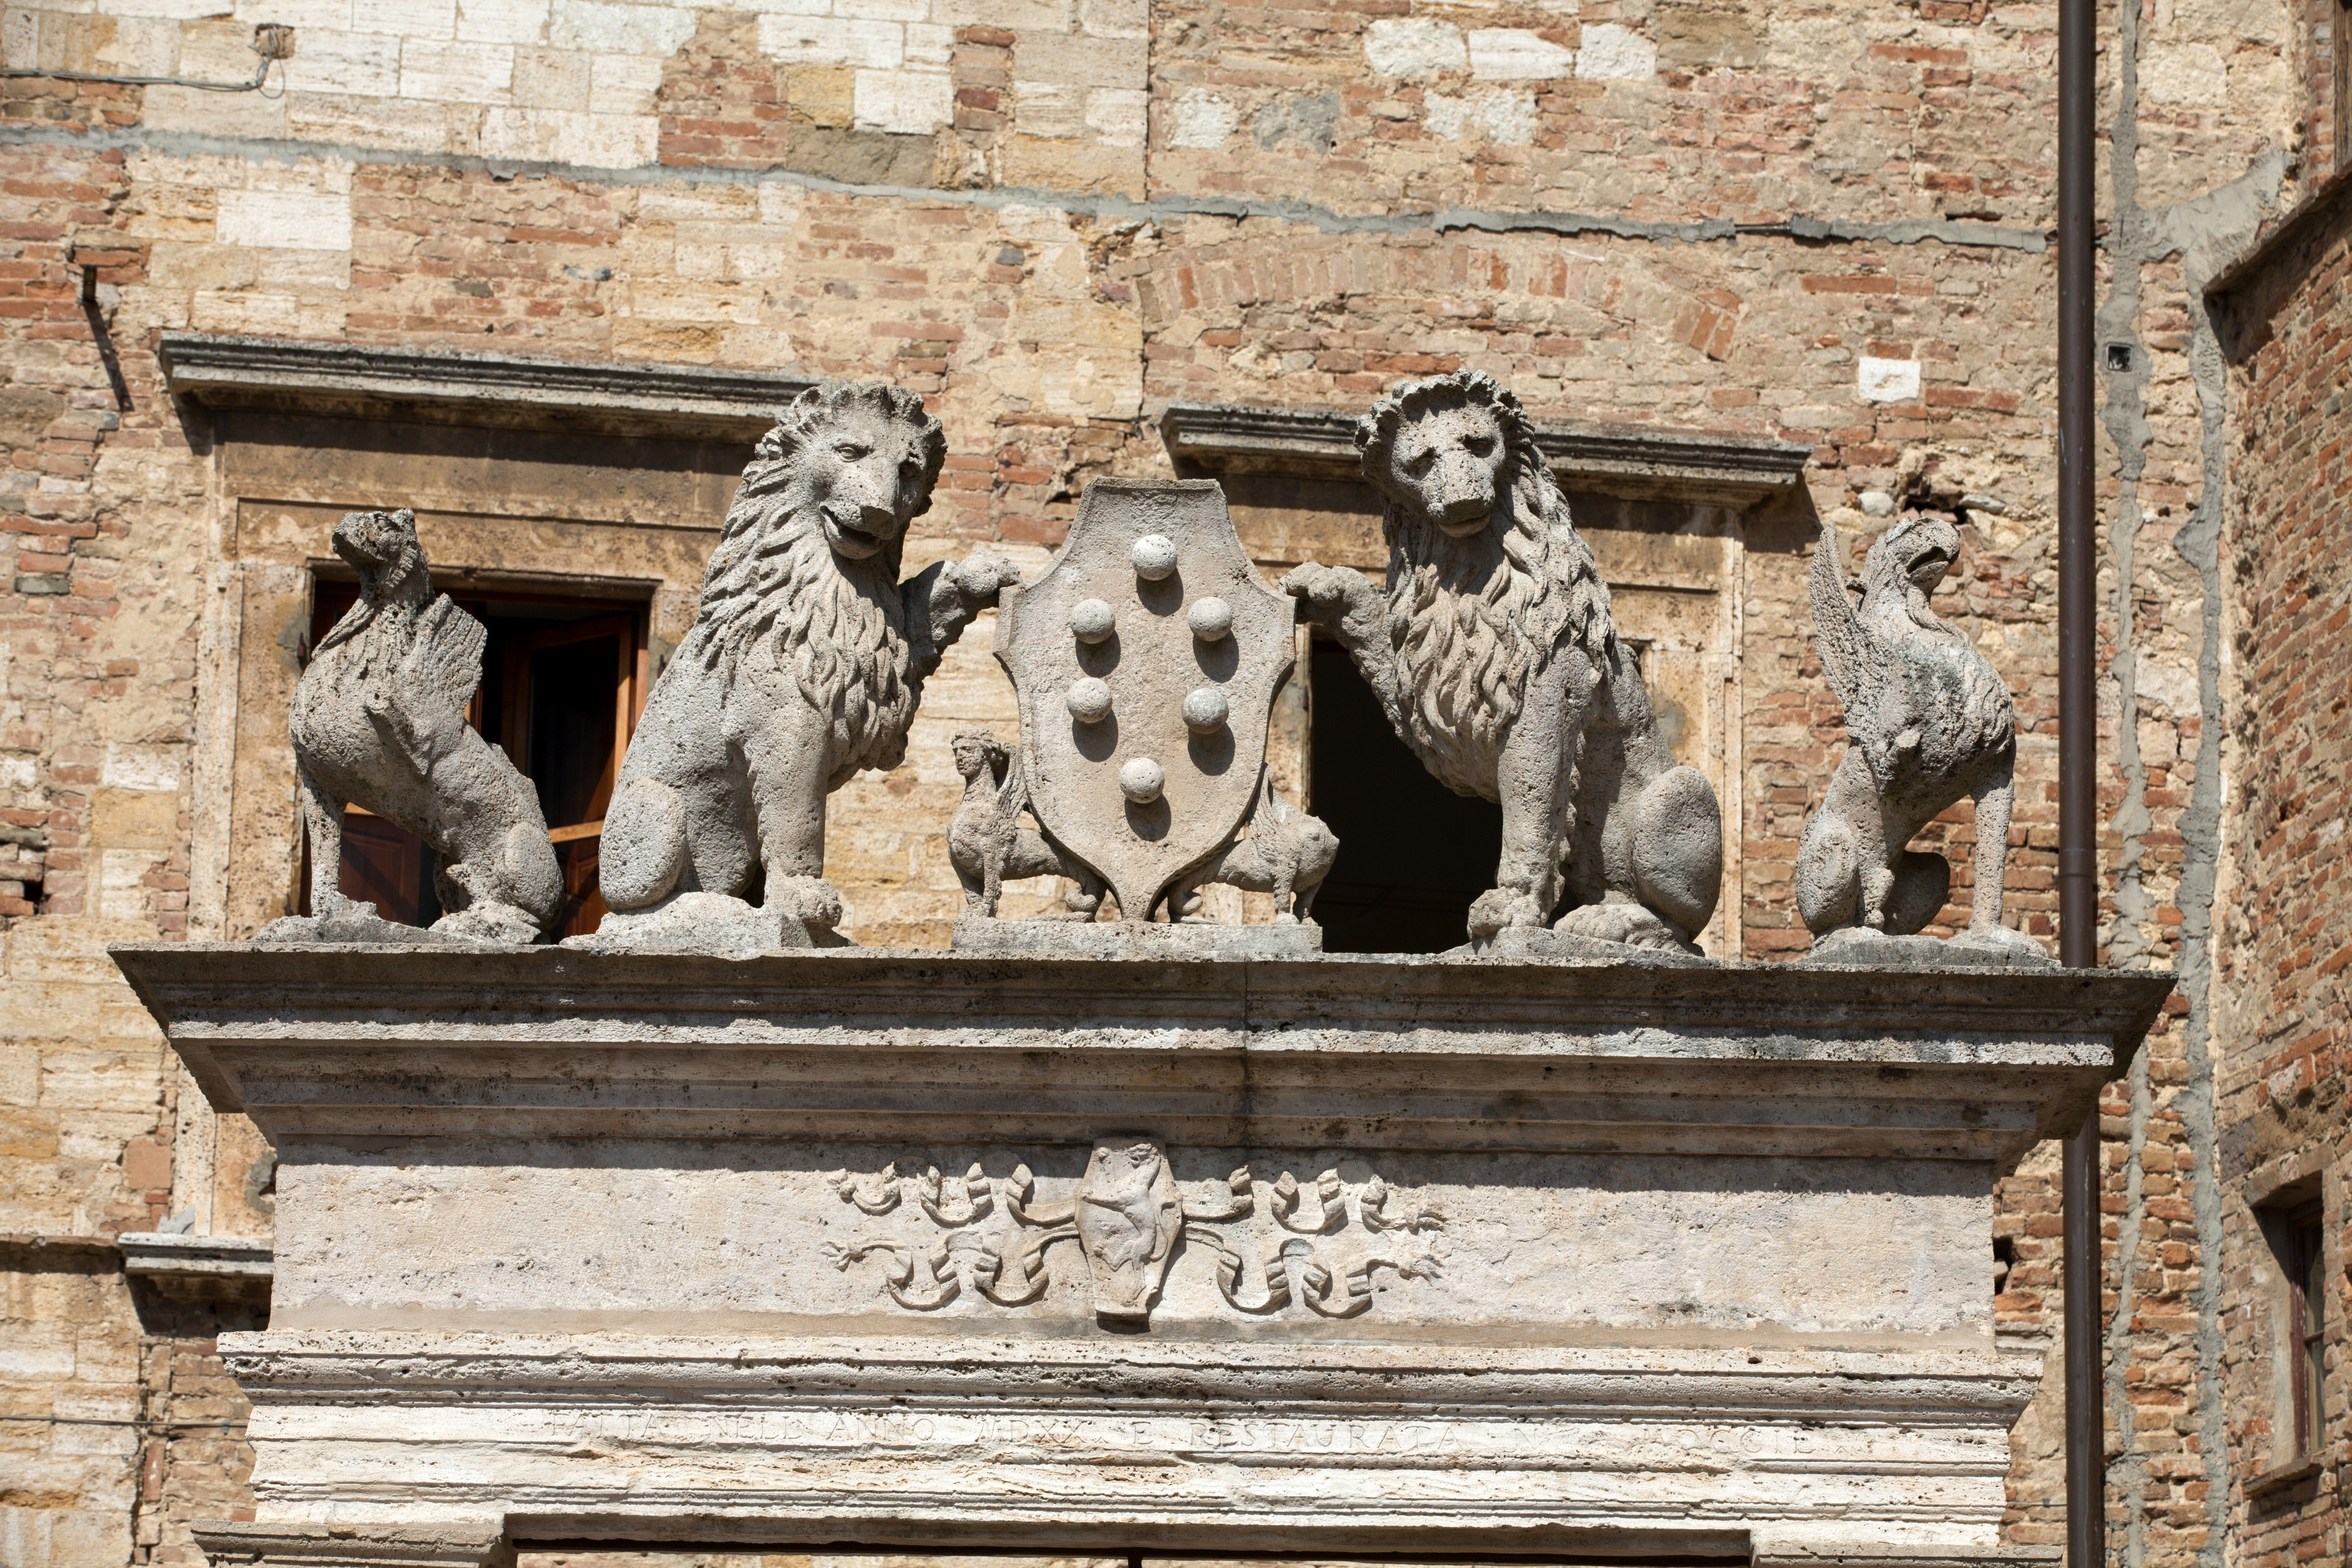 Piazza Grande, Montepulciano, Tuscany, Italy